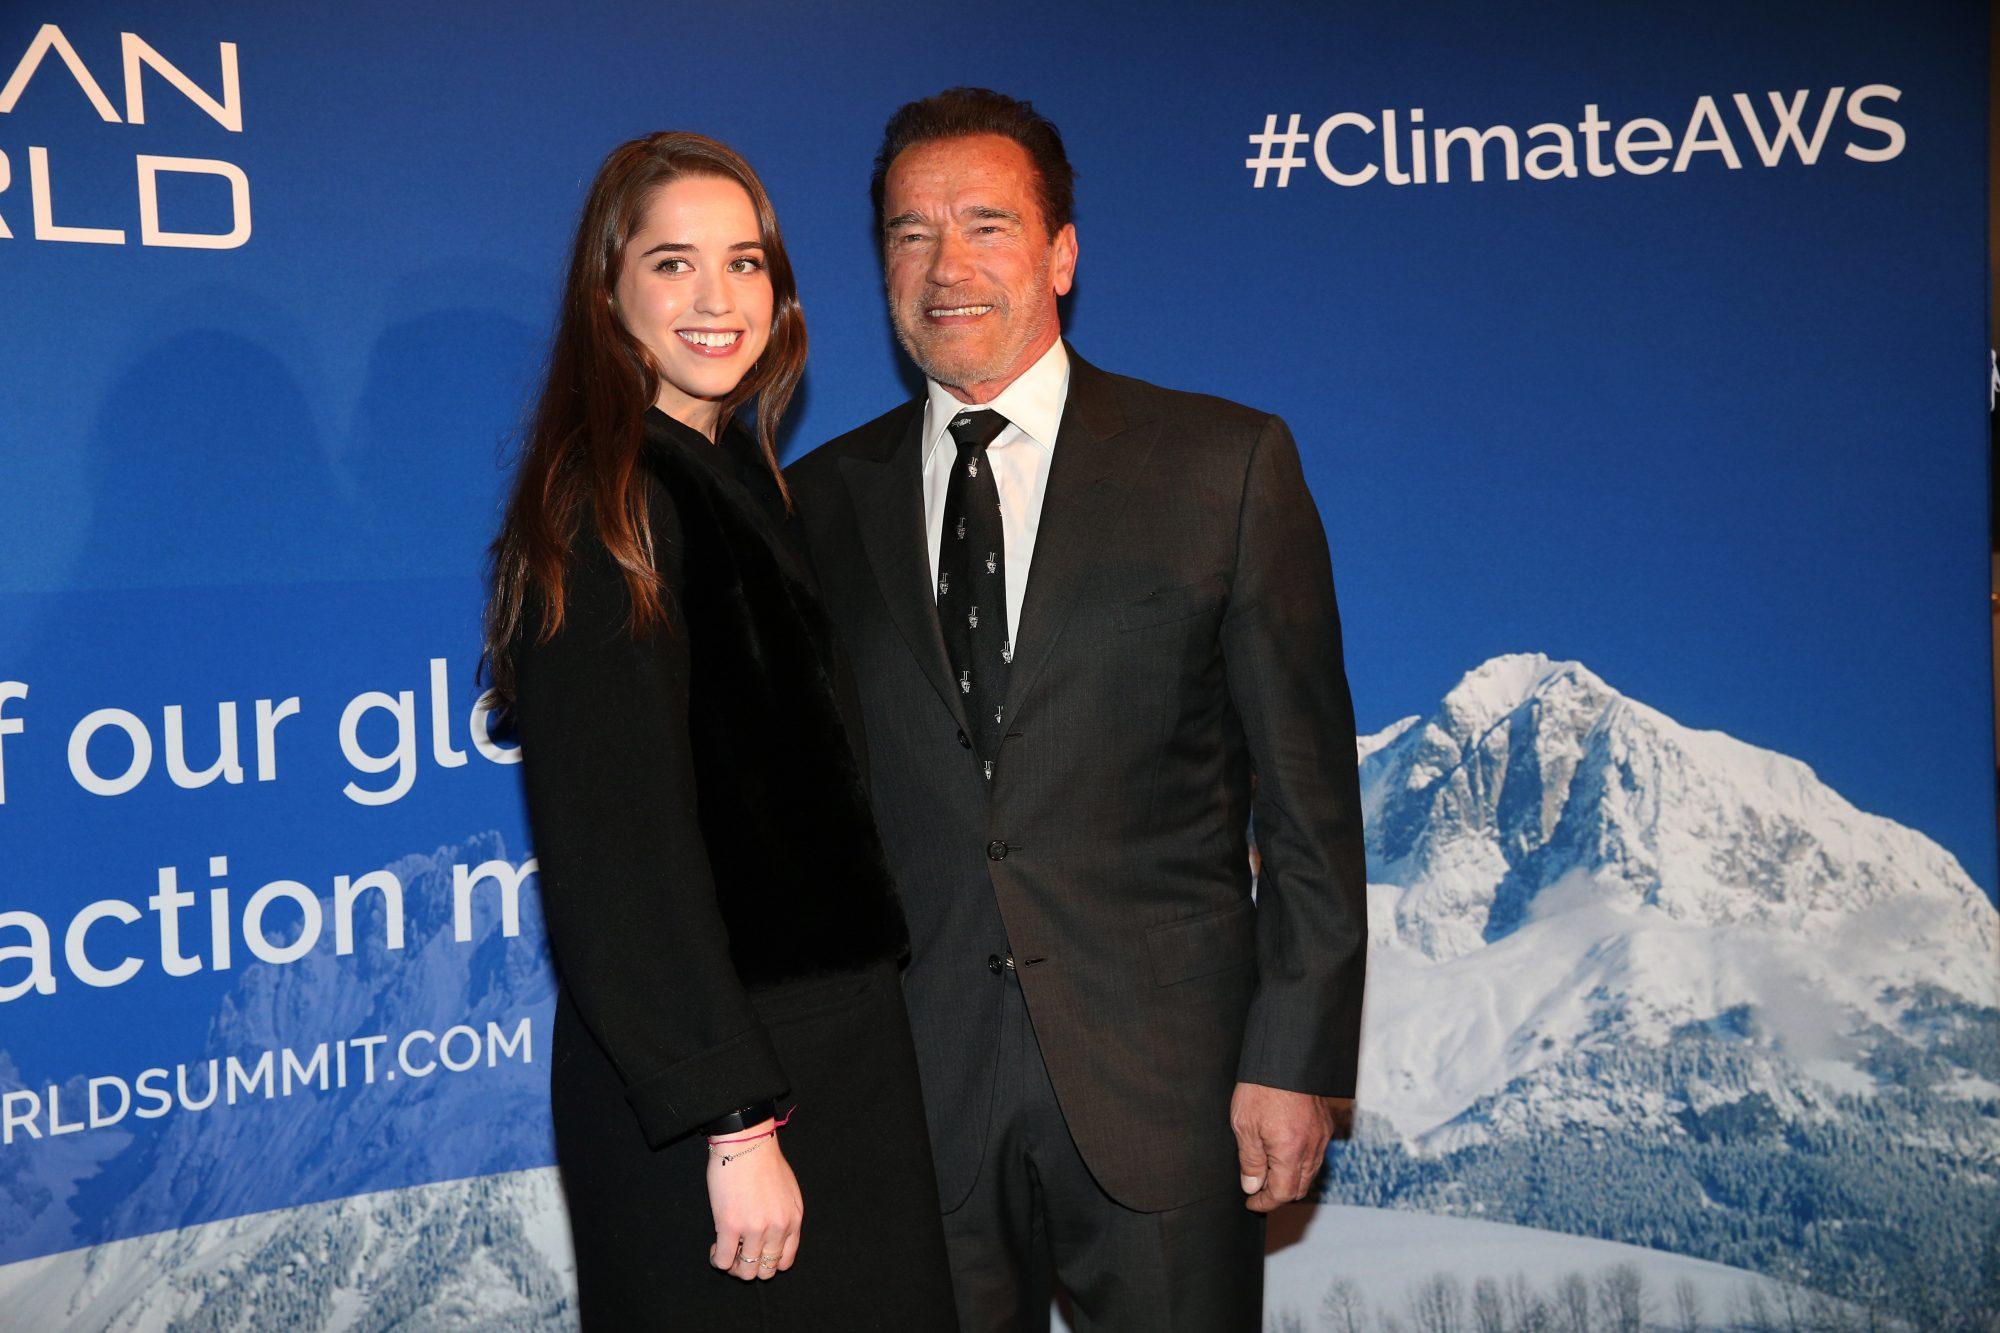 Cristina, hija de Maria Shriver y Arnold Schwarzenegger